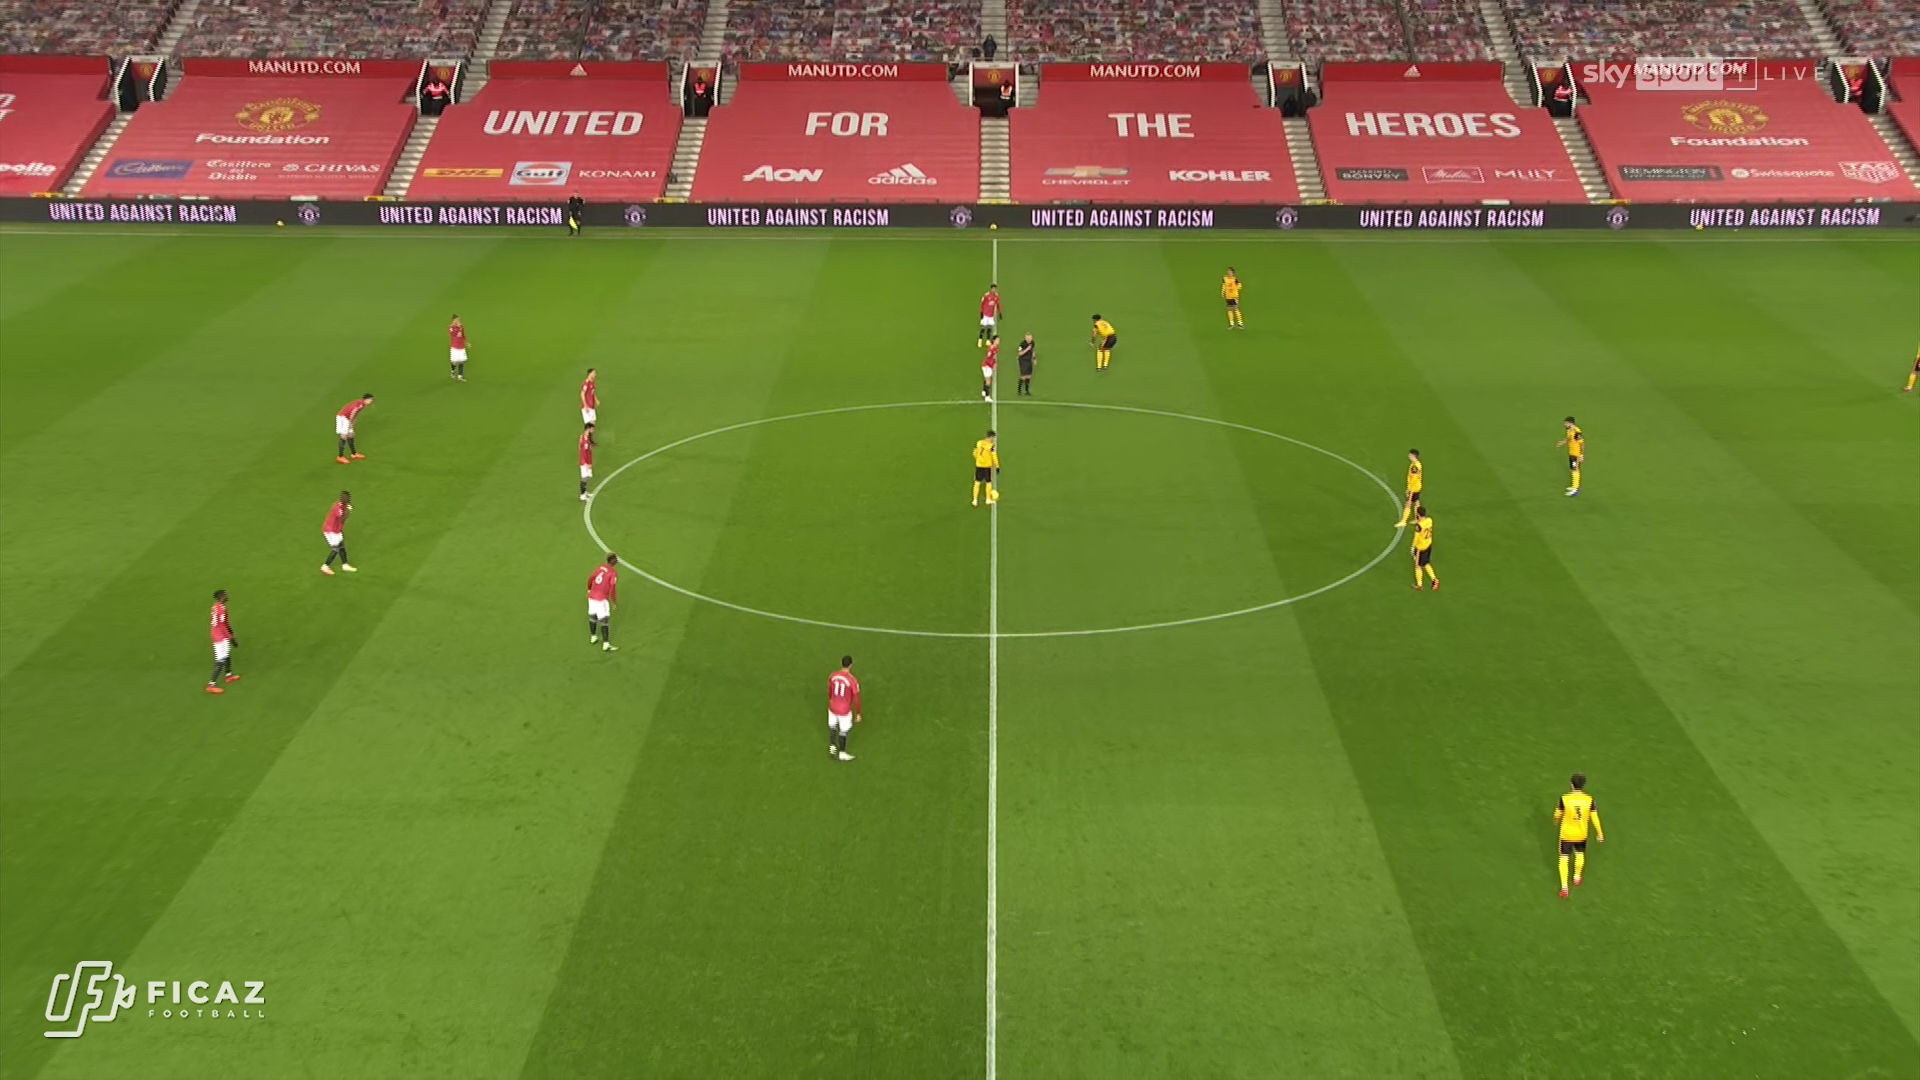 Manchester United F.C. - Main - Old Trafford